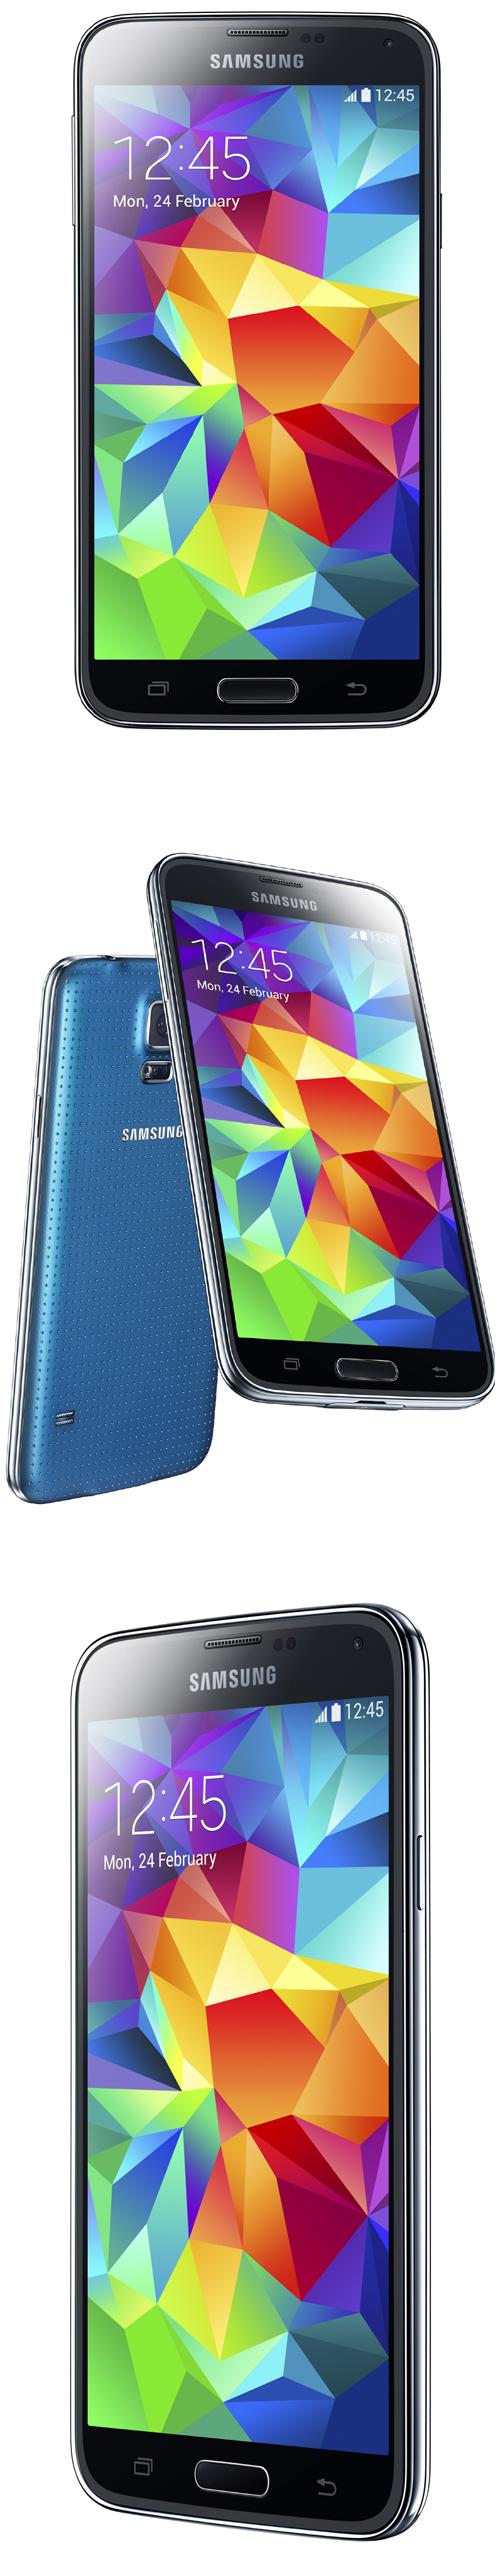 Le Samsung Galaxy S5 sera commercialisé le 11 avril en France